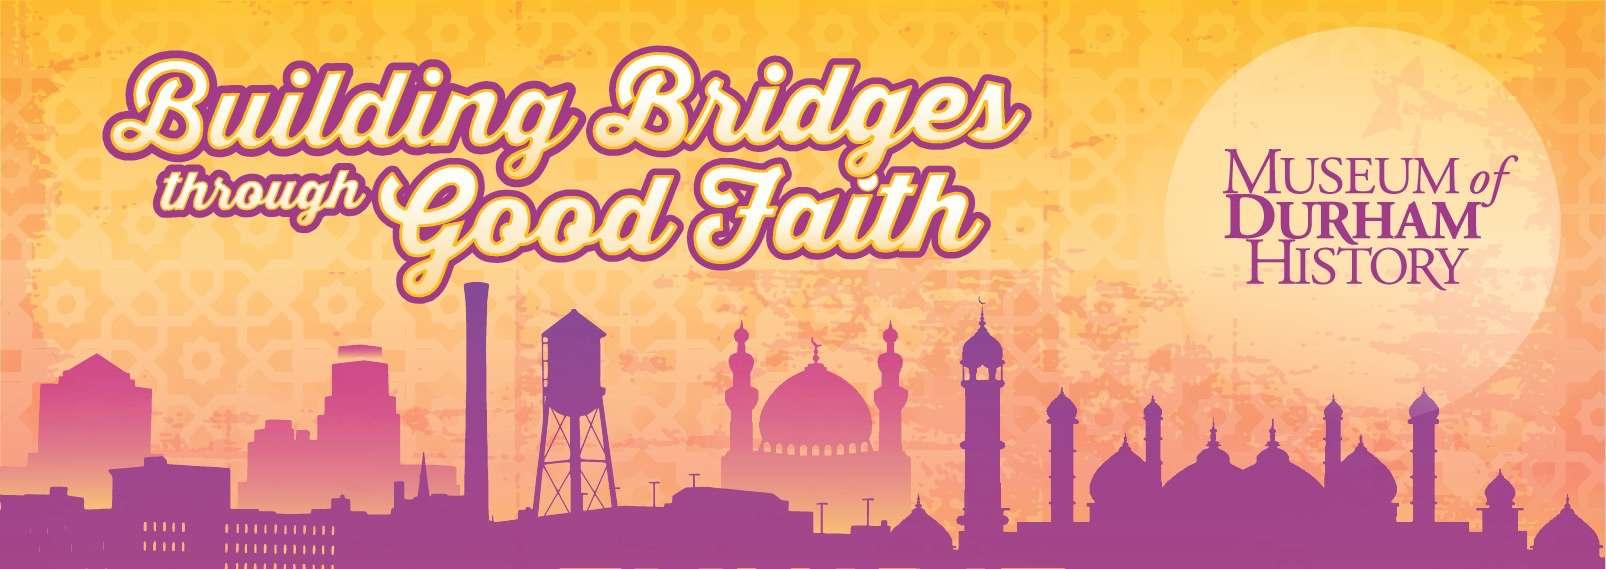 Building Bridges through Good Faith